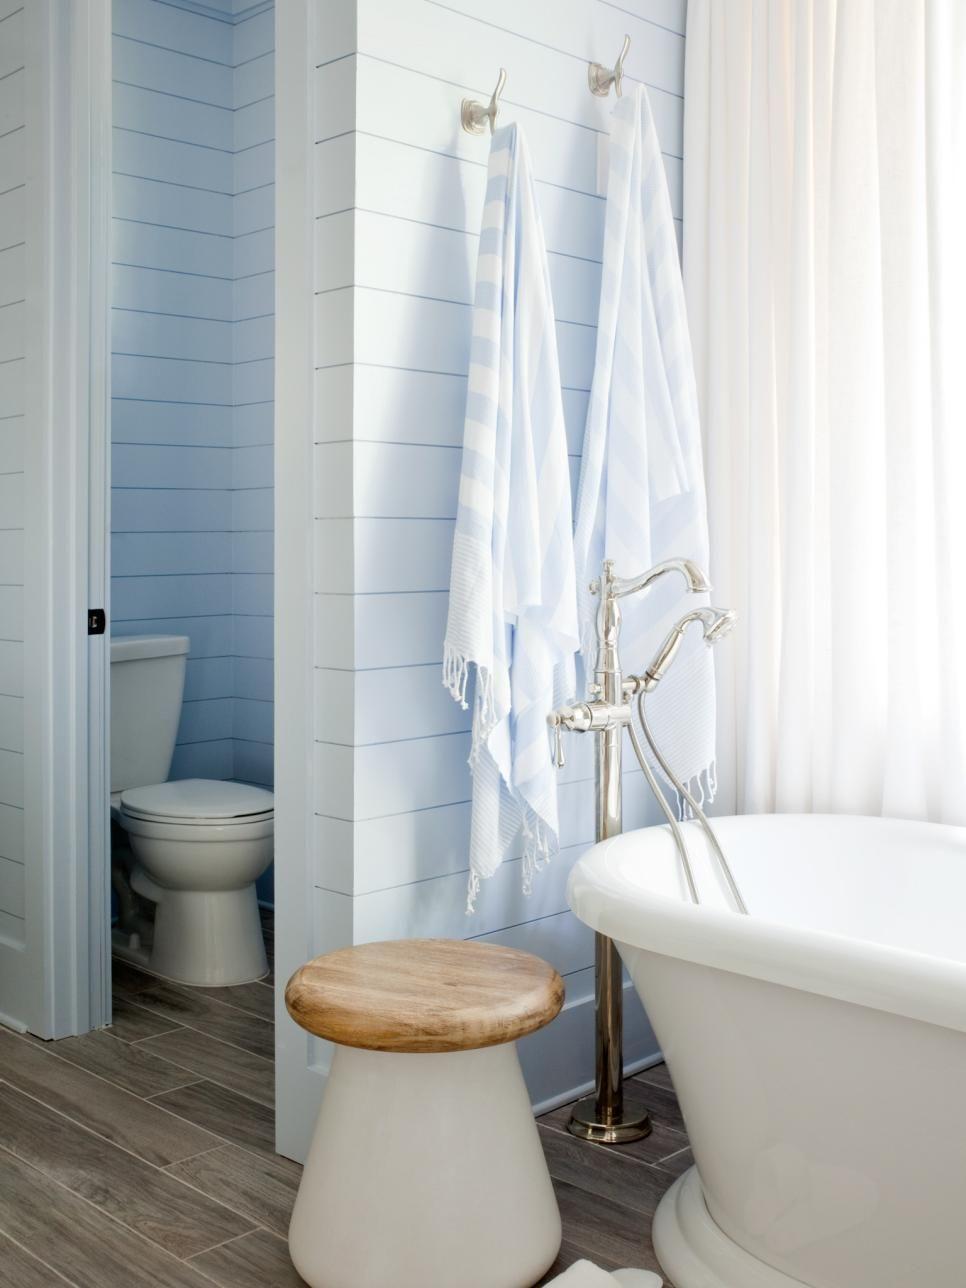 Dream Home 2017: Master Bathroom Pictures   Pinterest   Hgtv, Double ...